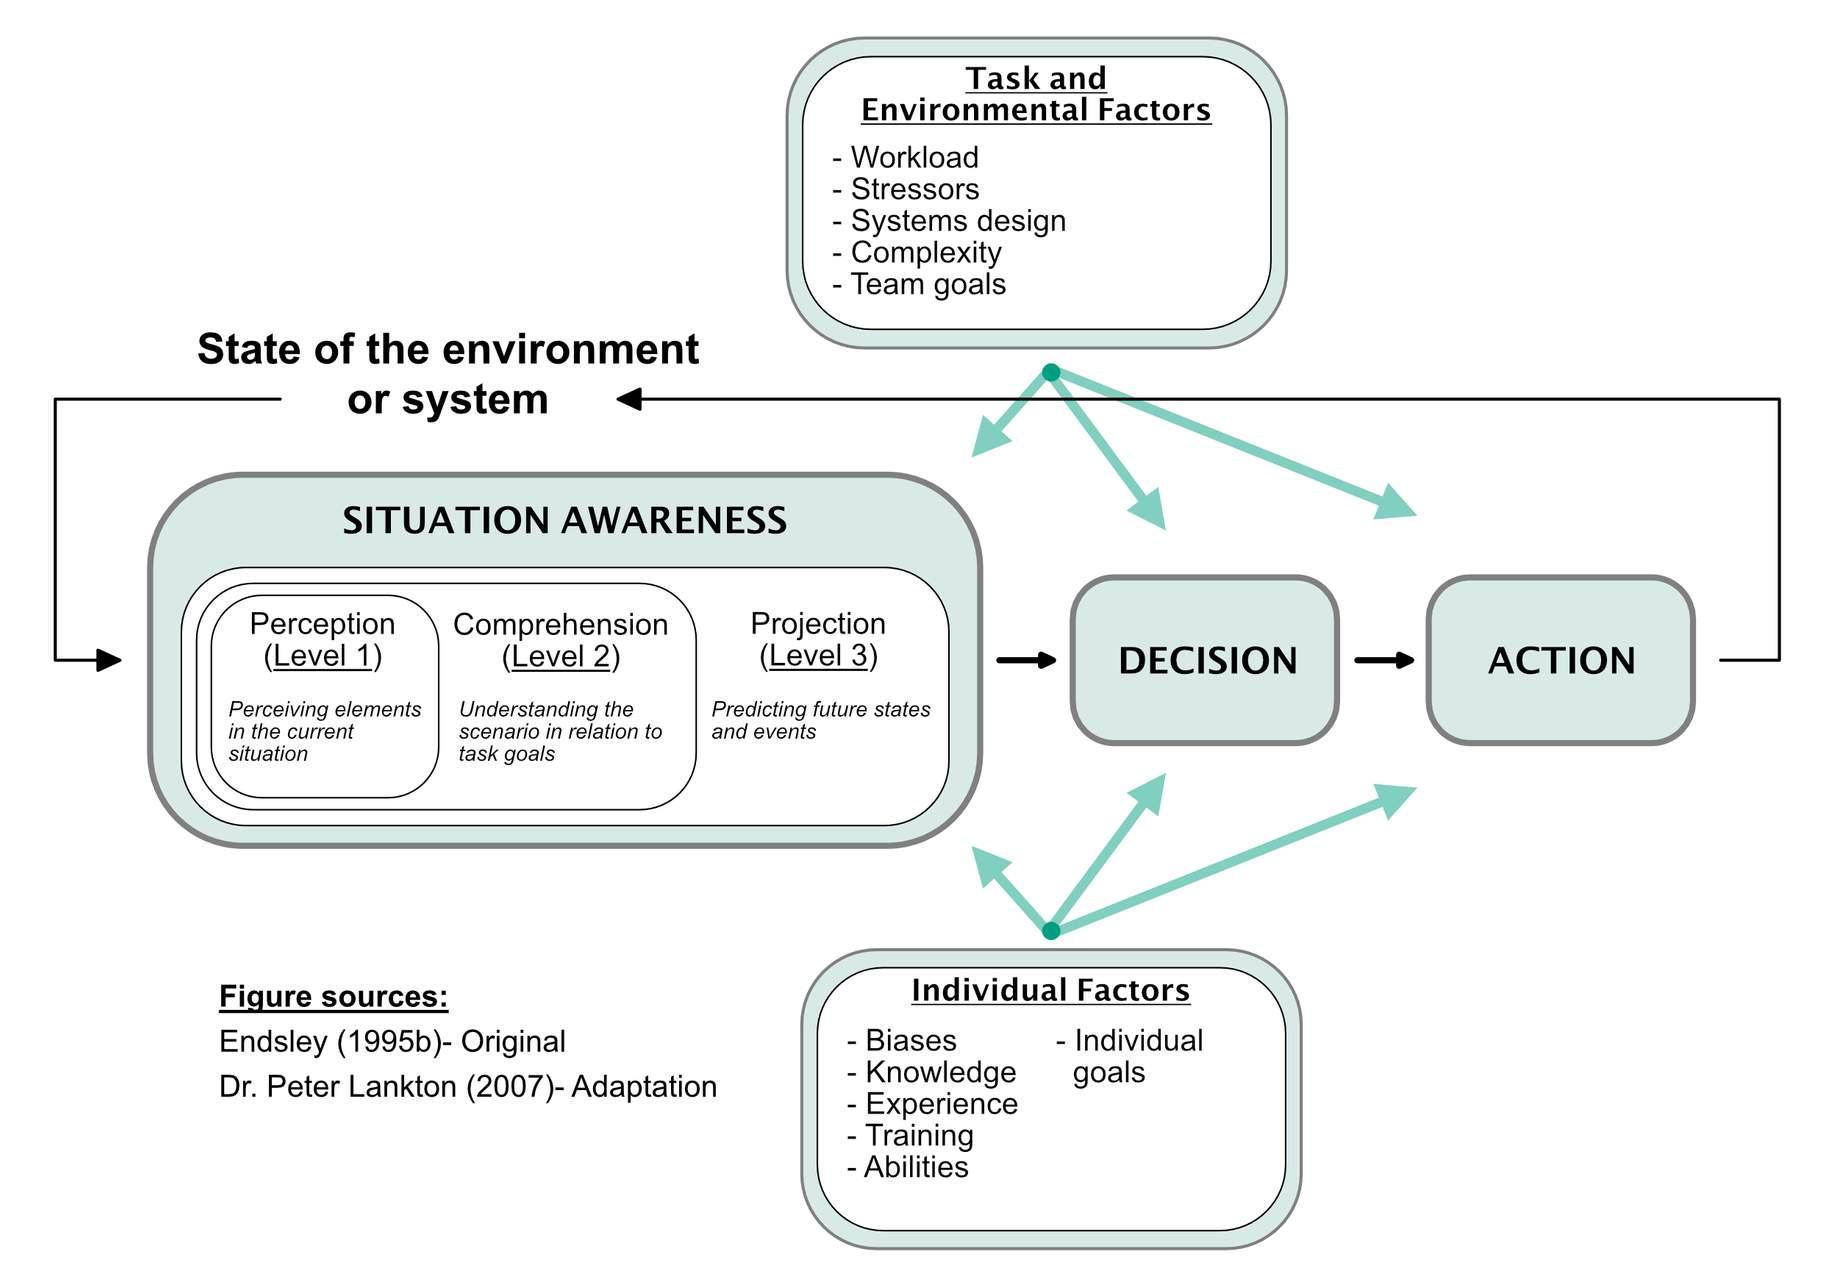 Figure 1:  Endsley's 3-level model of SA. Summarization of the model presented by Endsley (1995b) and Endsley et al (2015).